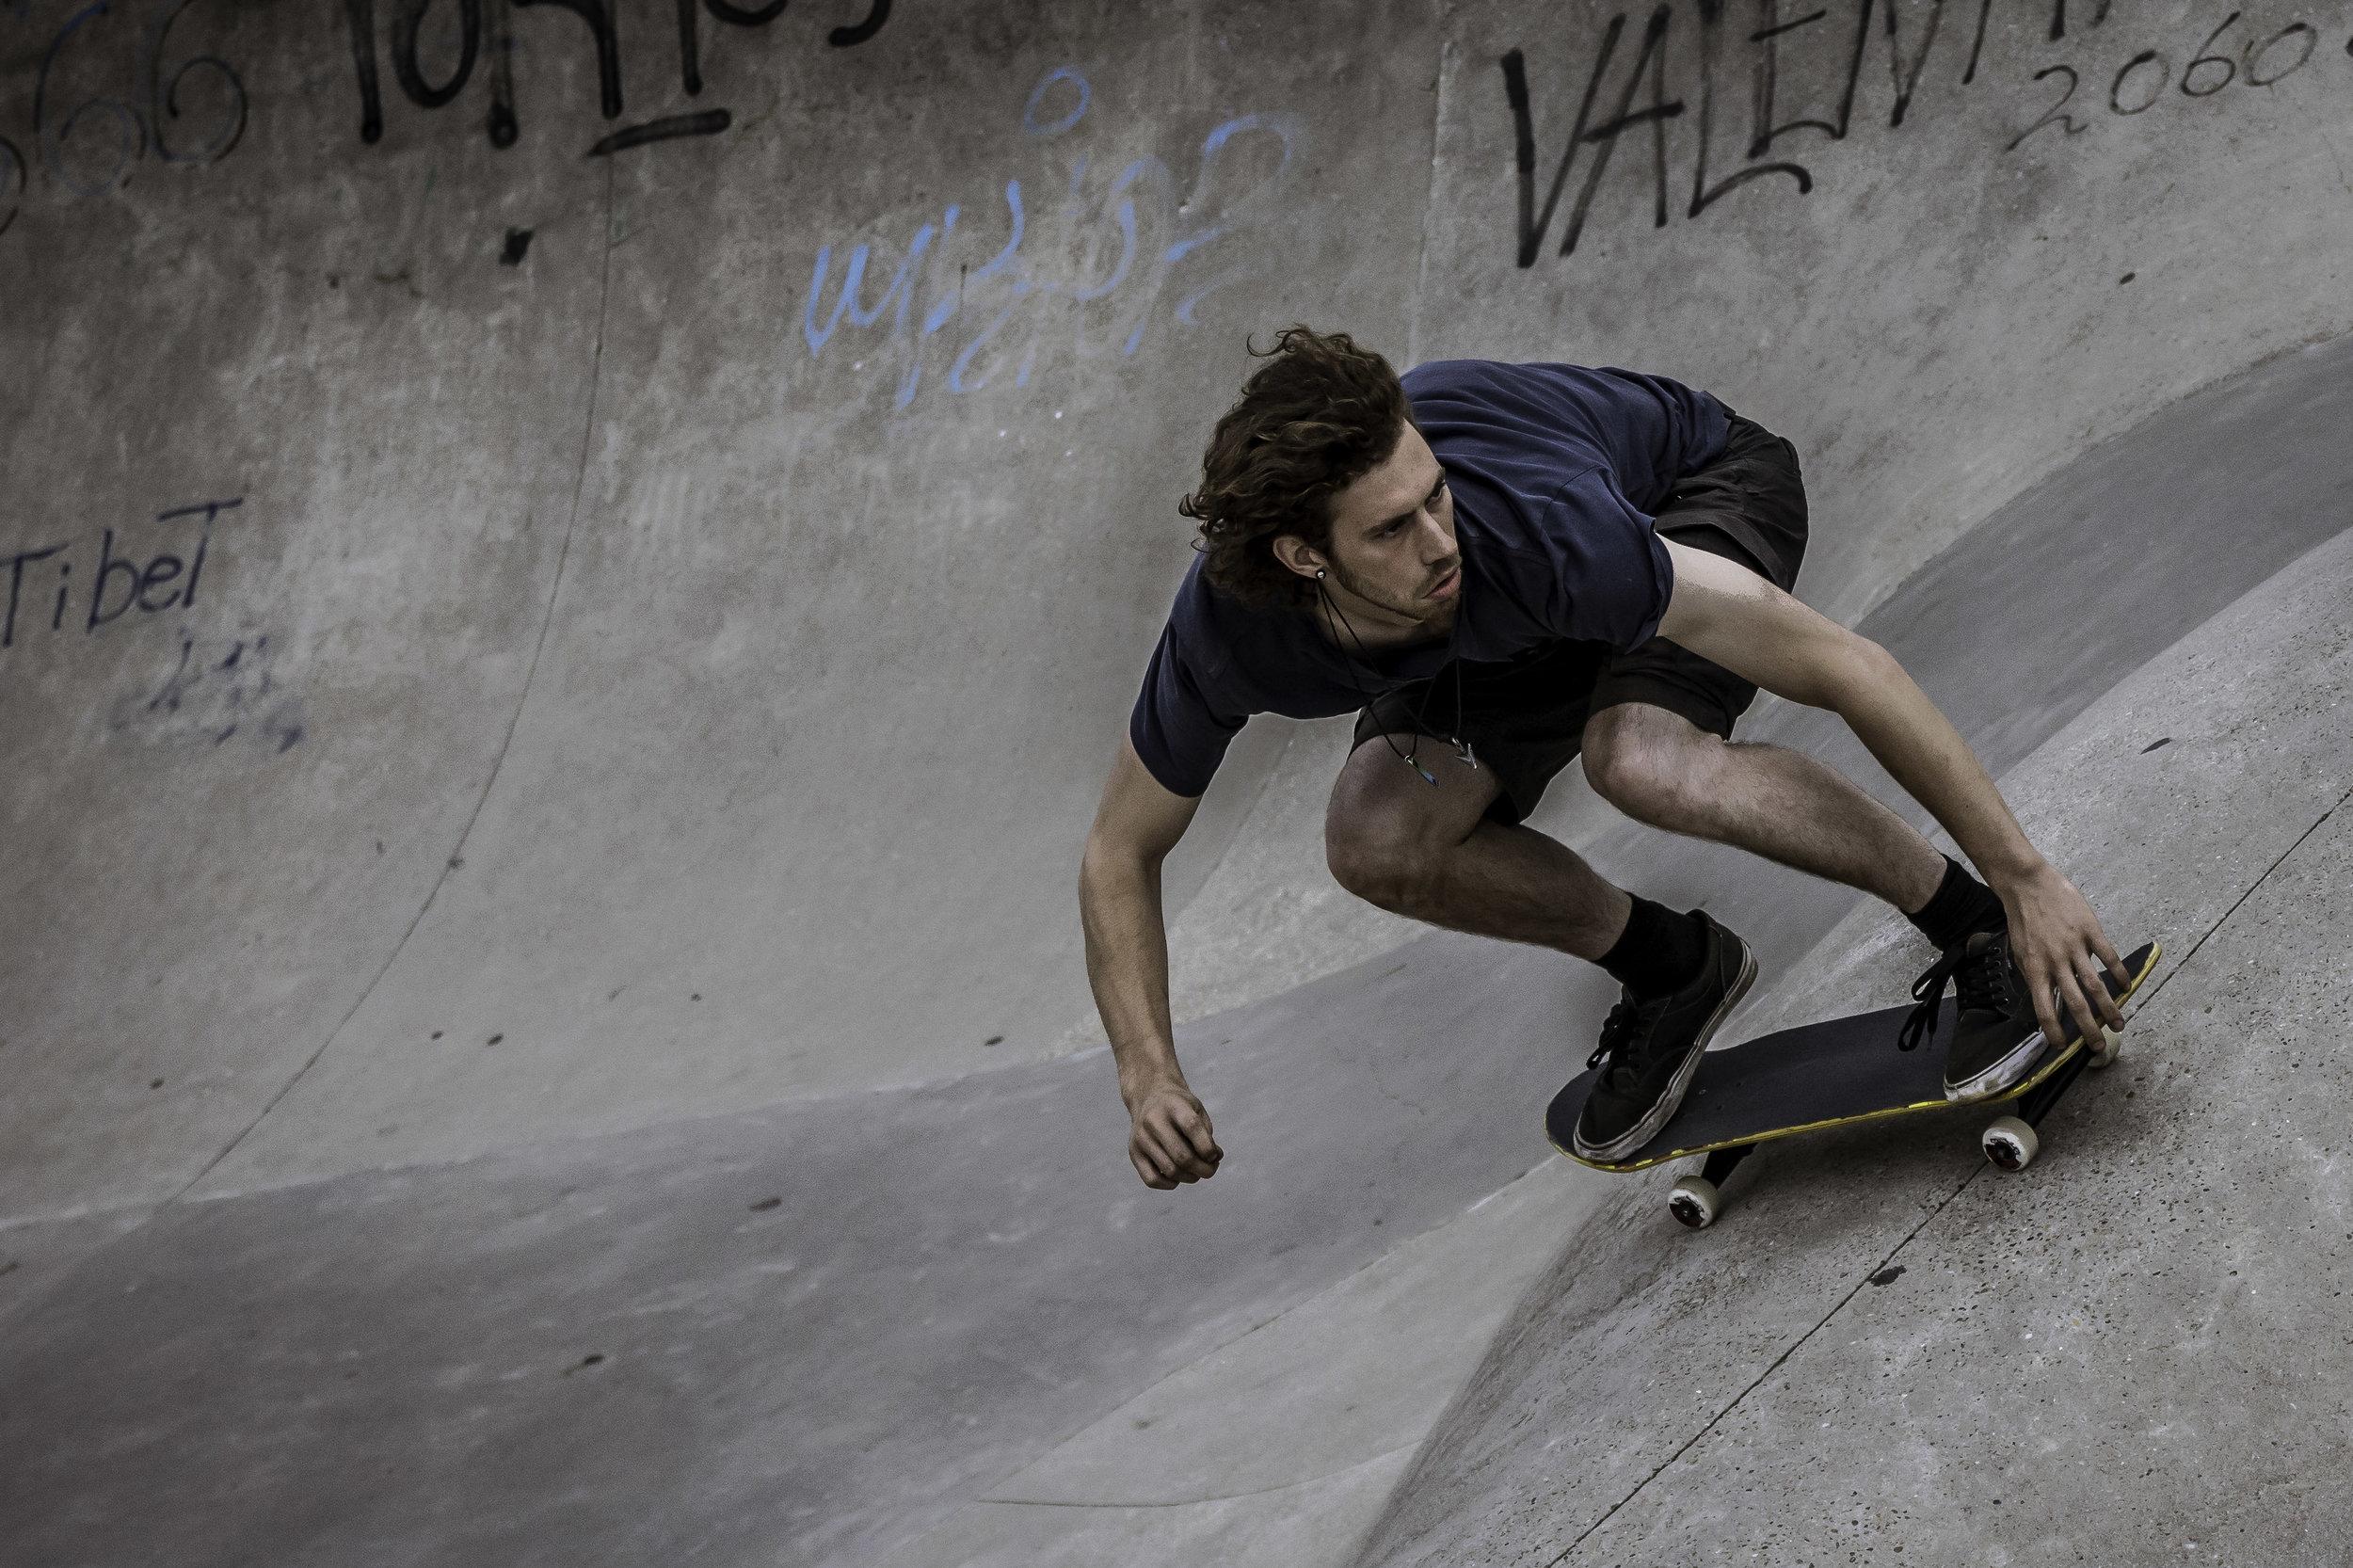 viewfinder-creativeboody-skaten-park-spoor-noord-antwerpen-sportfotografie-5.jpg